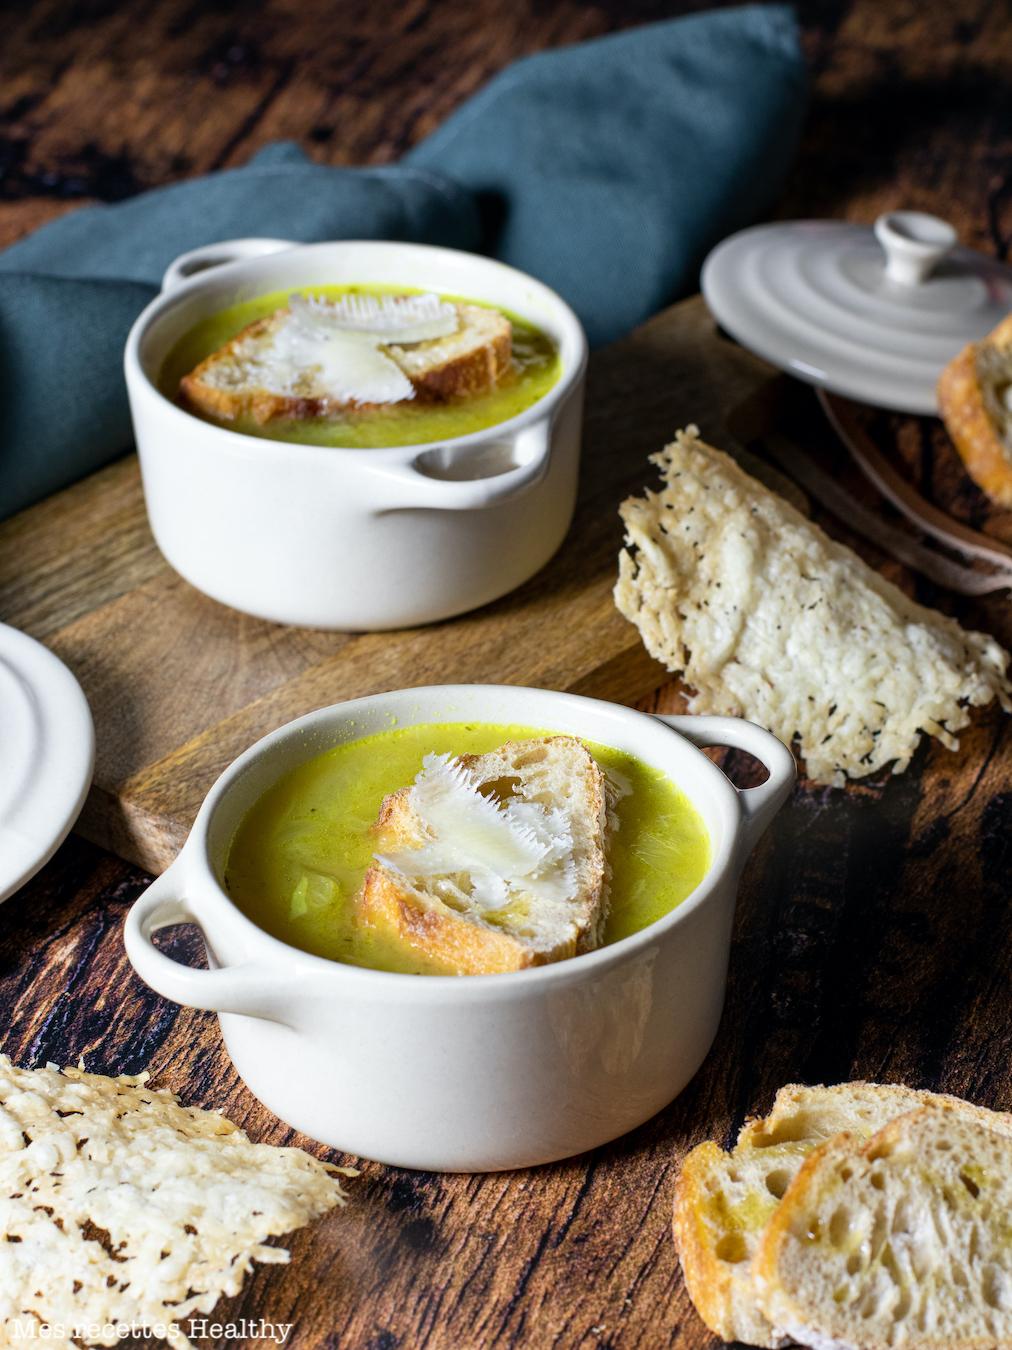 recette Healthy-soupe oignon-crouton-tuile fromage-tuile pecorino